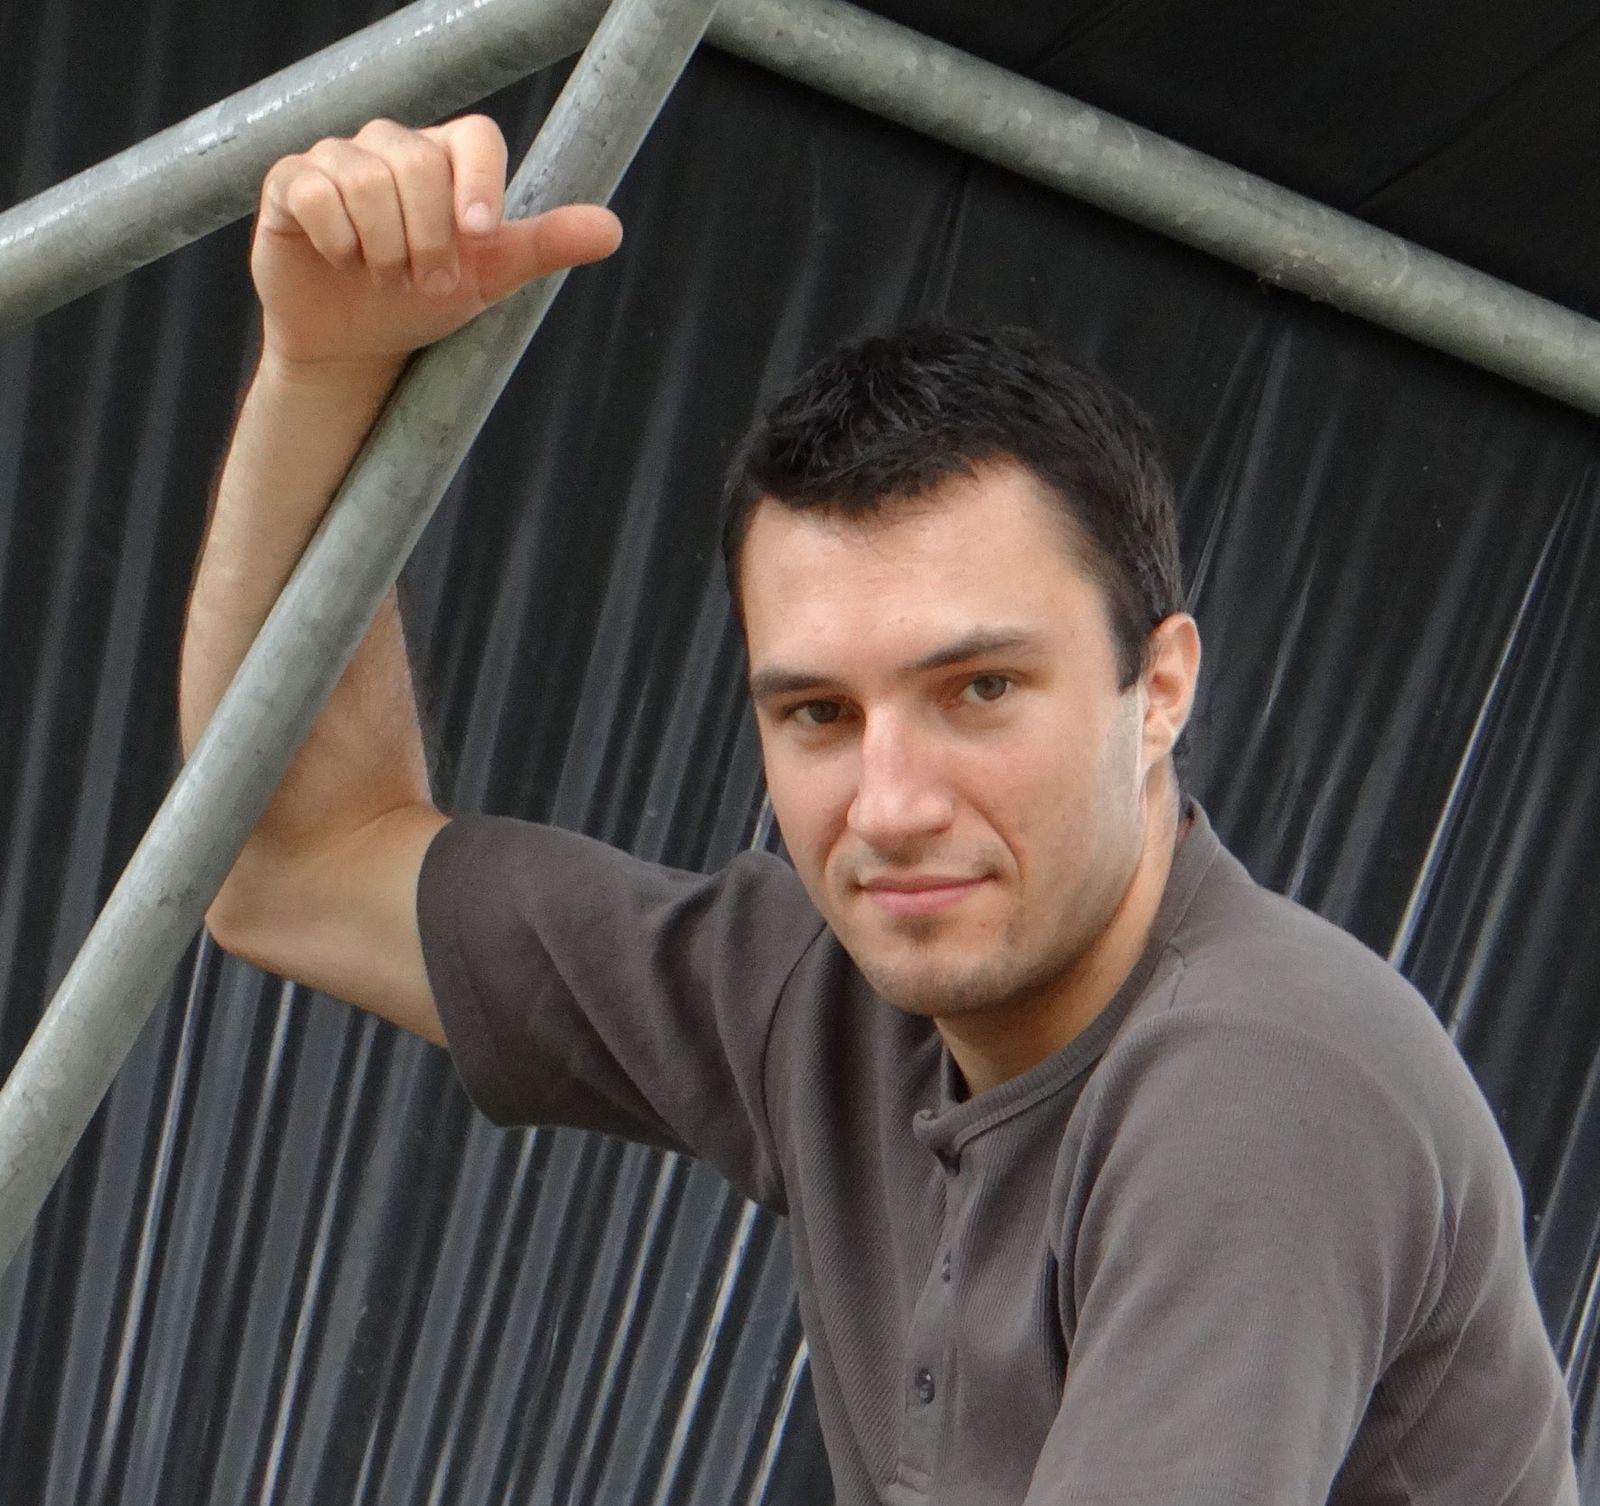 Jean-Clément Morlet